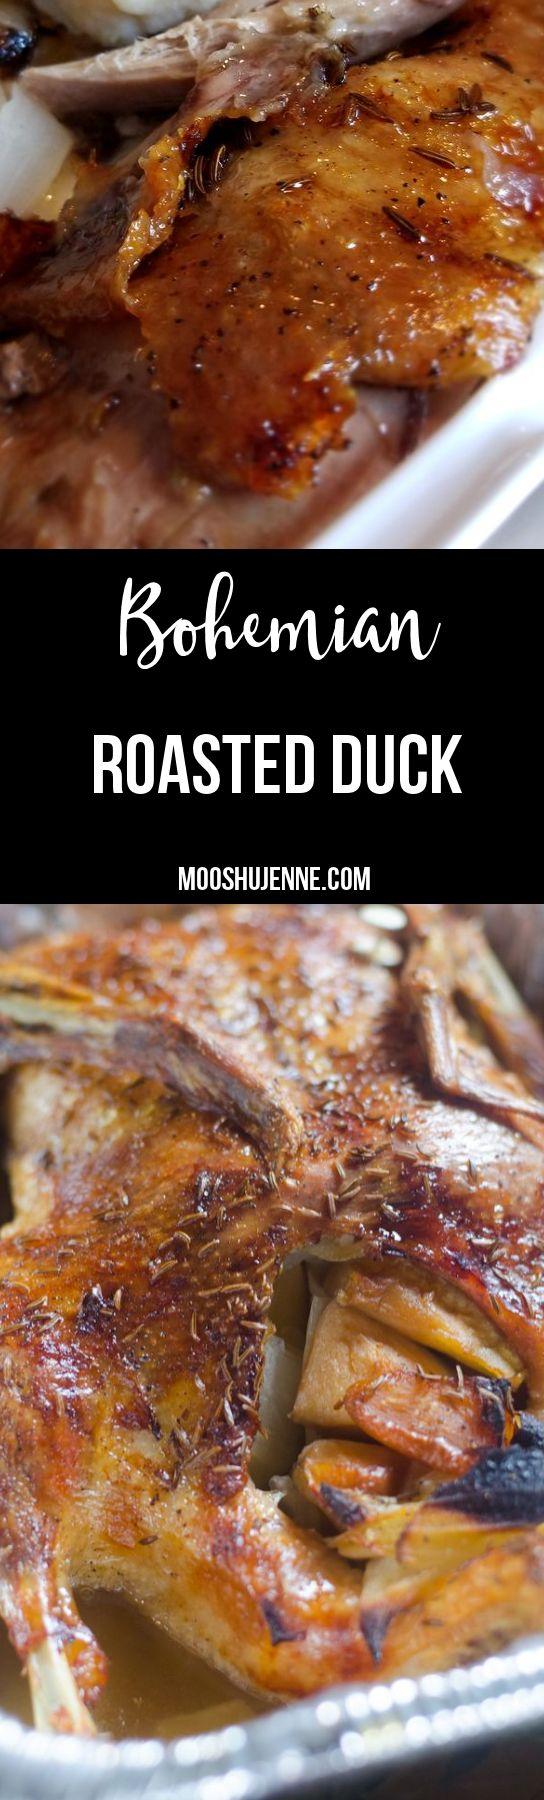 Bohemian Roasted Duck